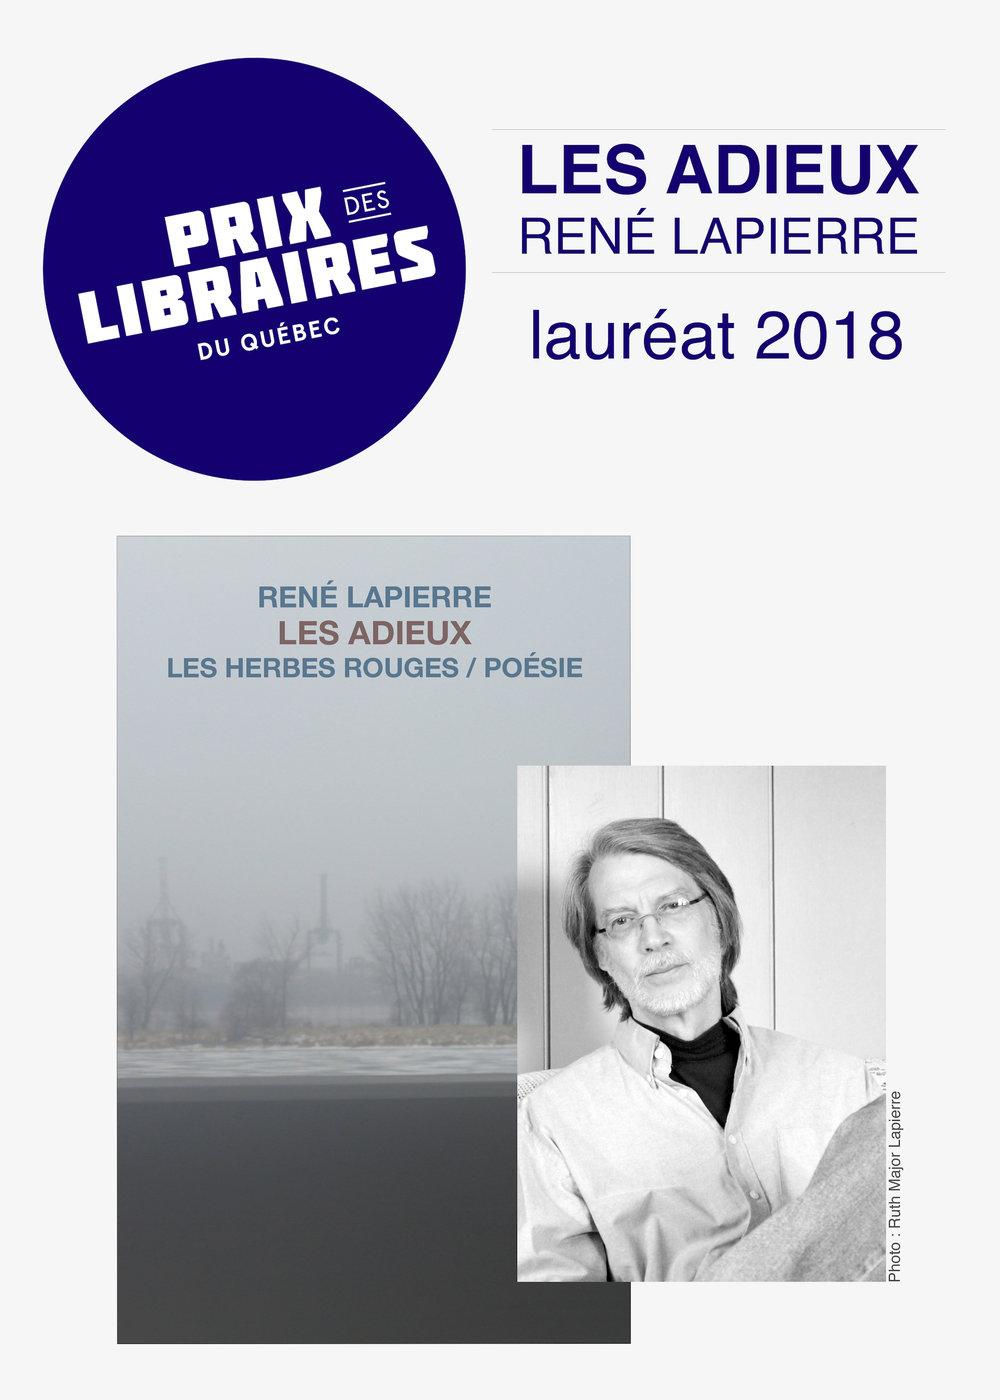 Lapierre_PDL_72dpi.jpg